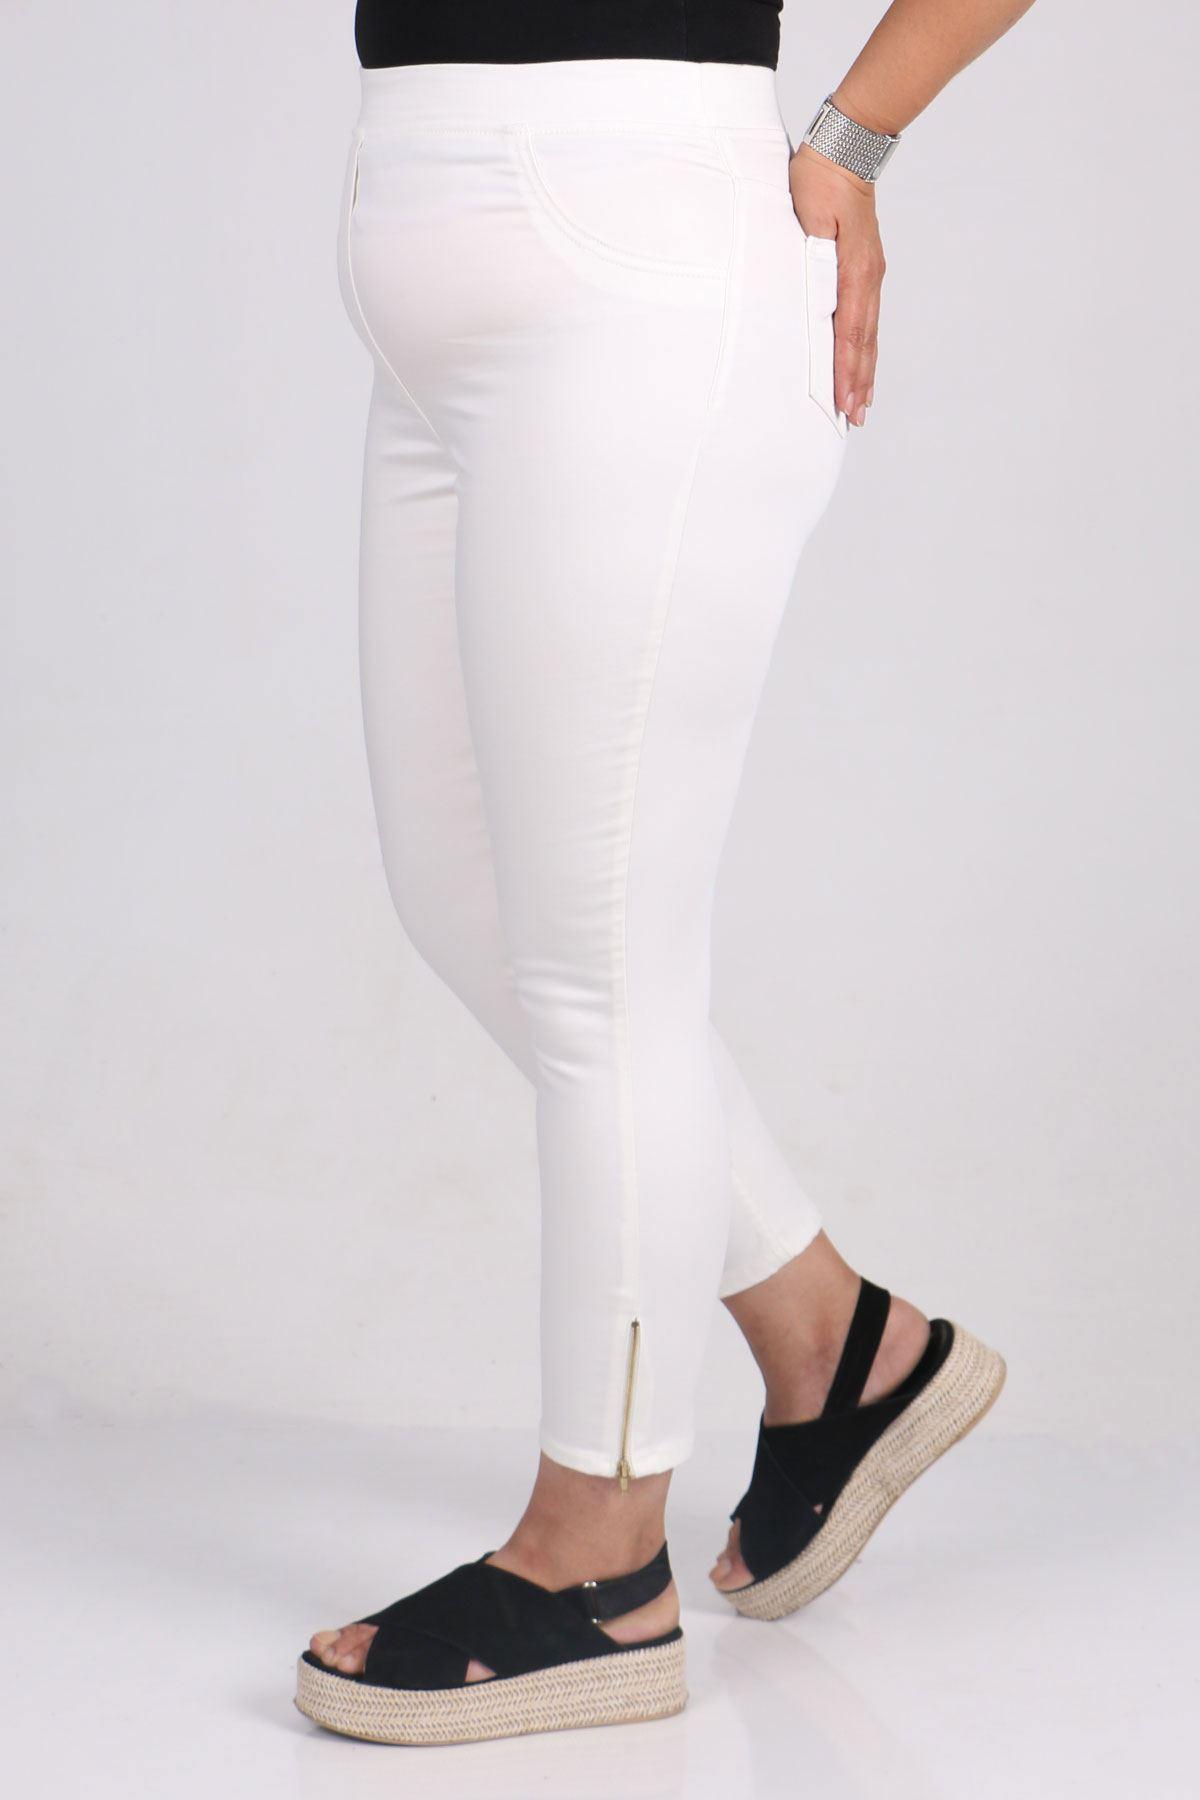 9121-1 Plus Size Zipper Detailed Skinny Leg Jeans-Dark Blue